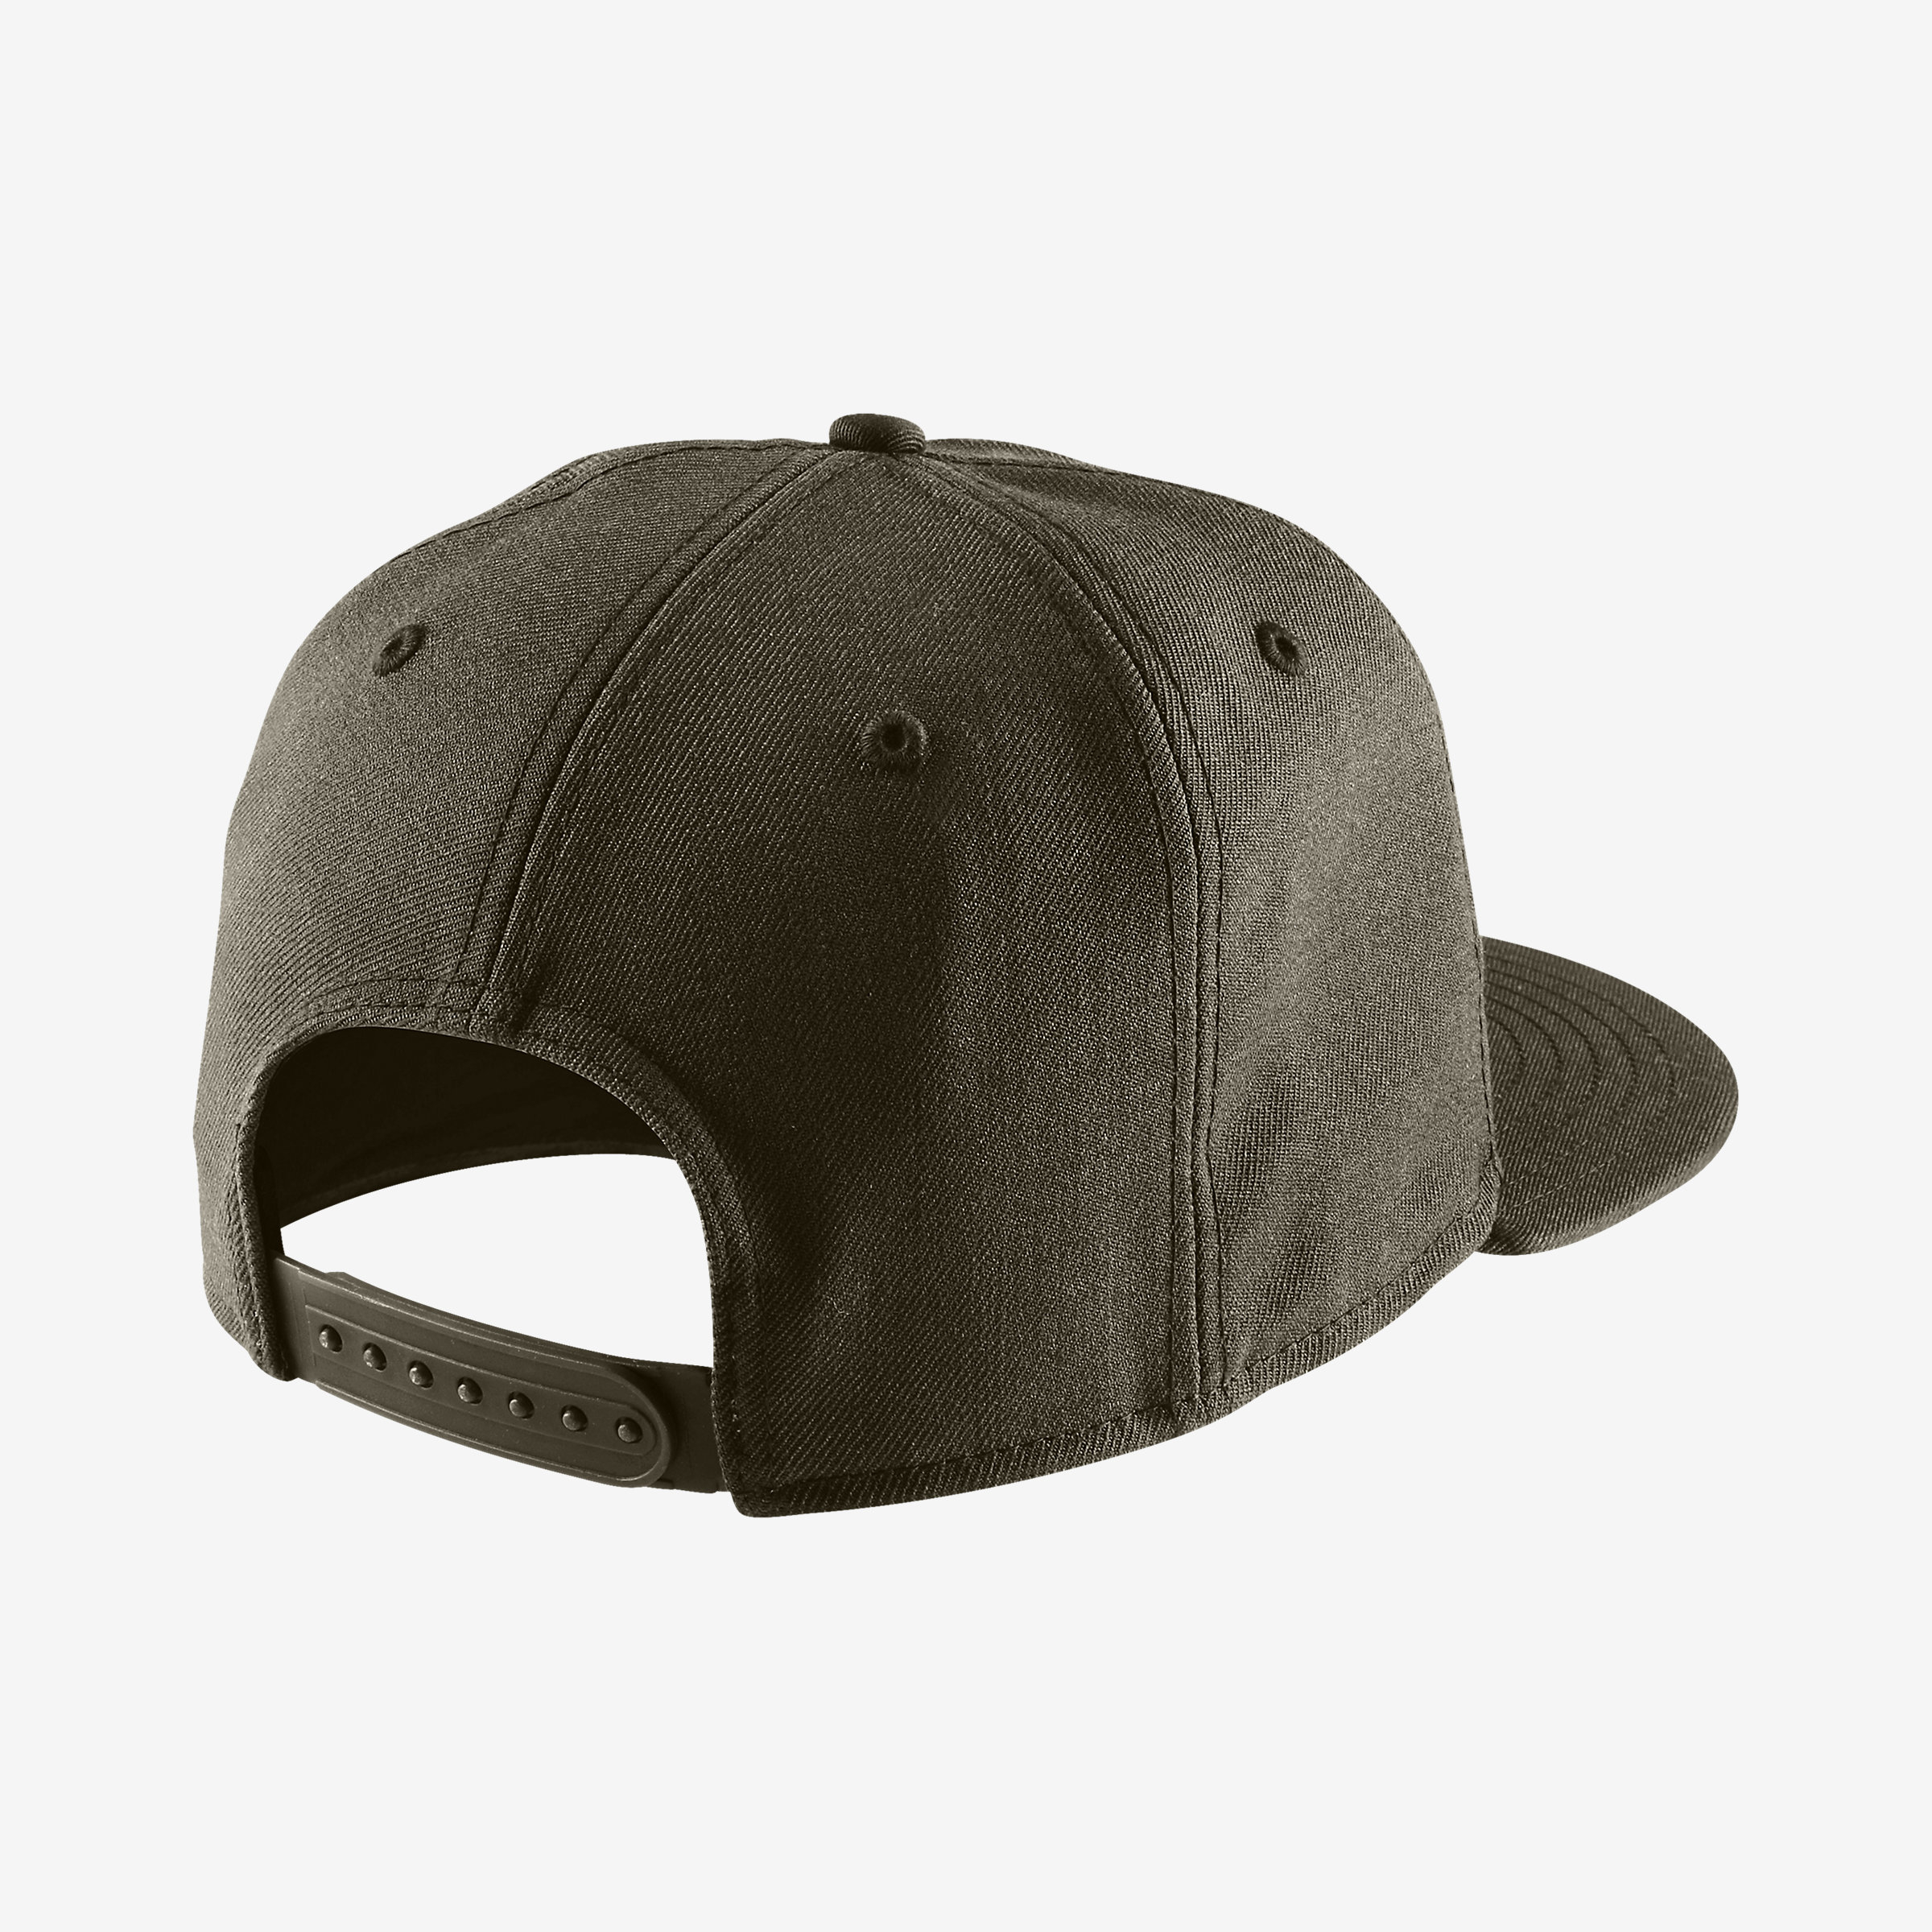 799fff5643cfa Nike Futura True 2 Snapback Hat (olive) in Green for Men - Lyst